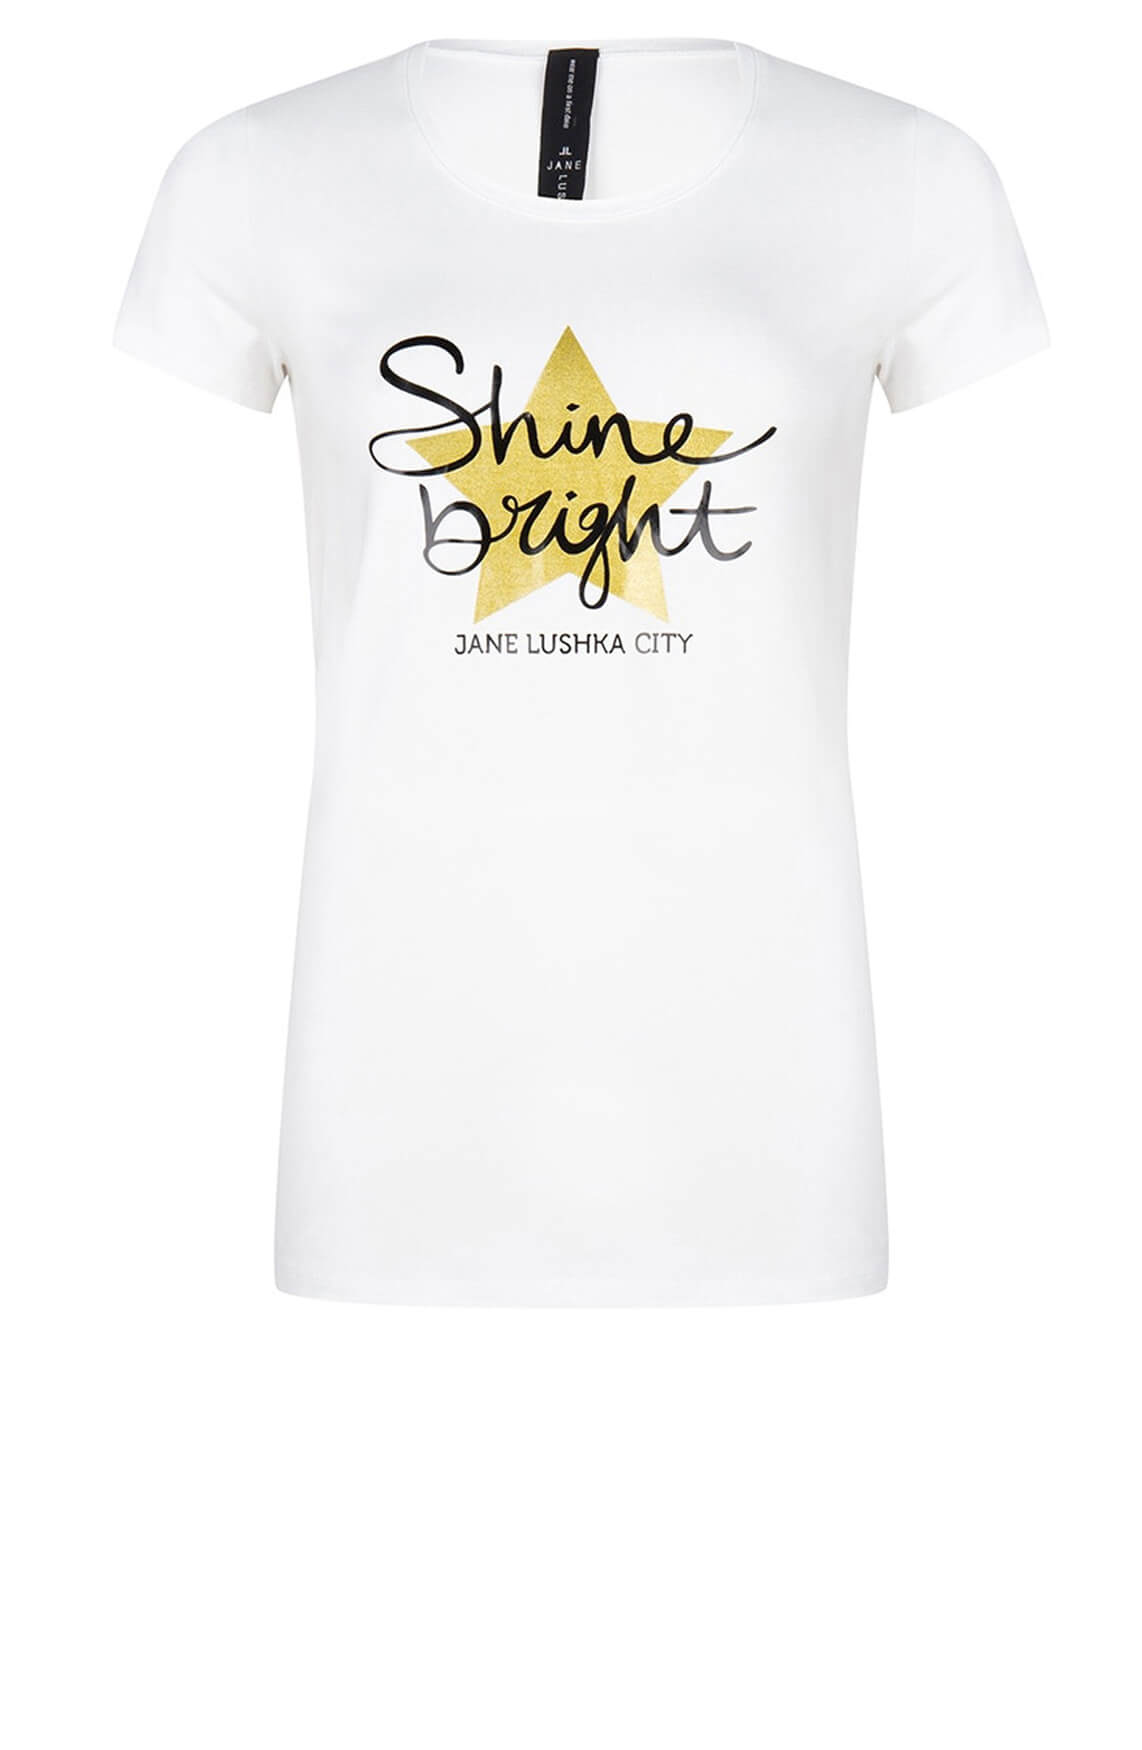 Jane Lushka Dames Frankie shine bright shirt wit